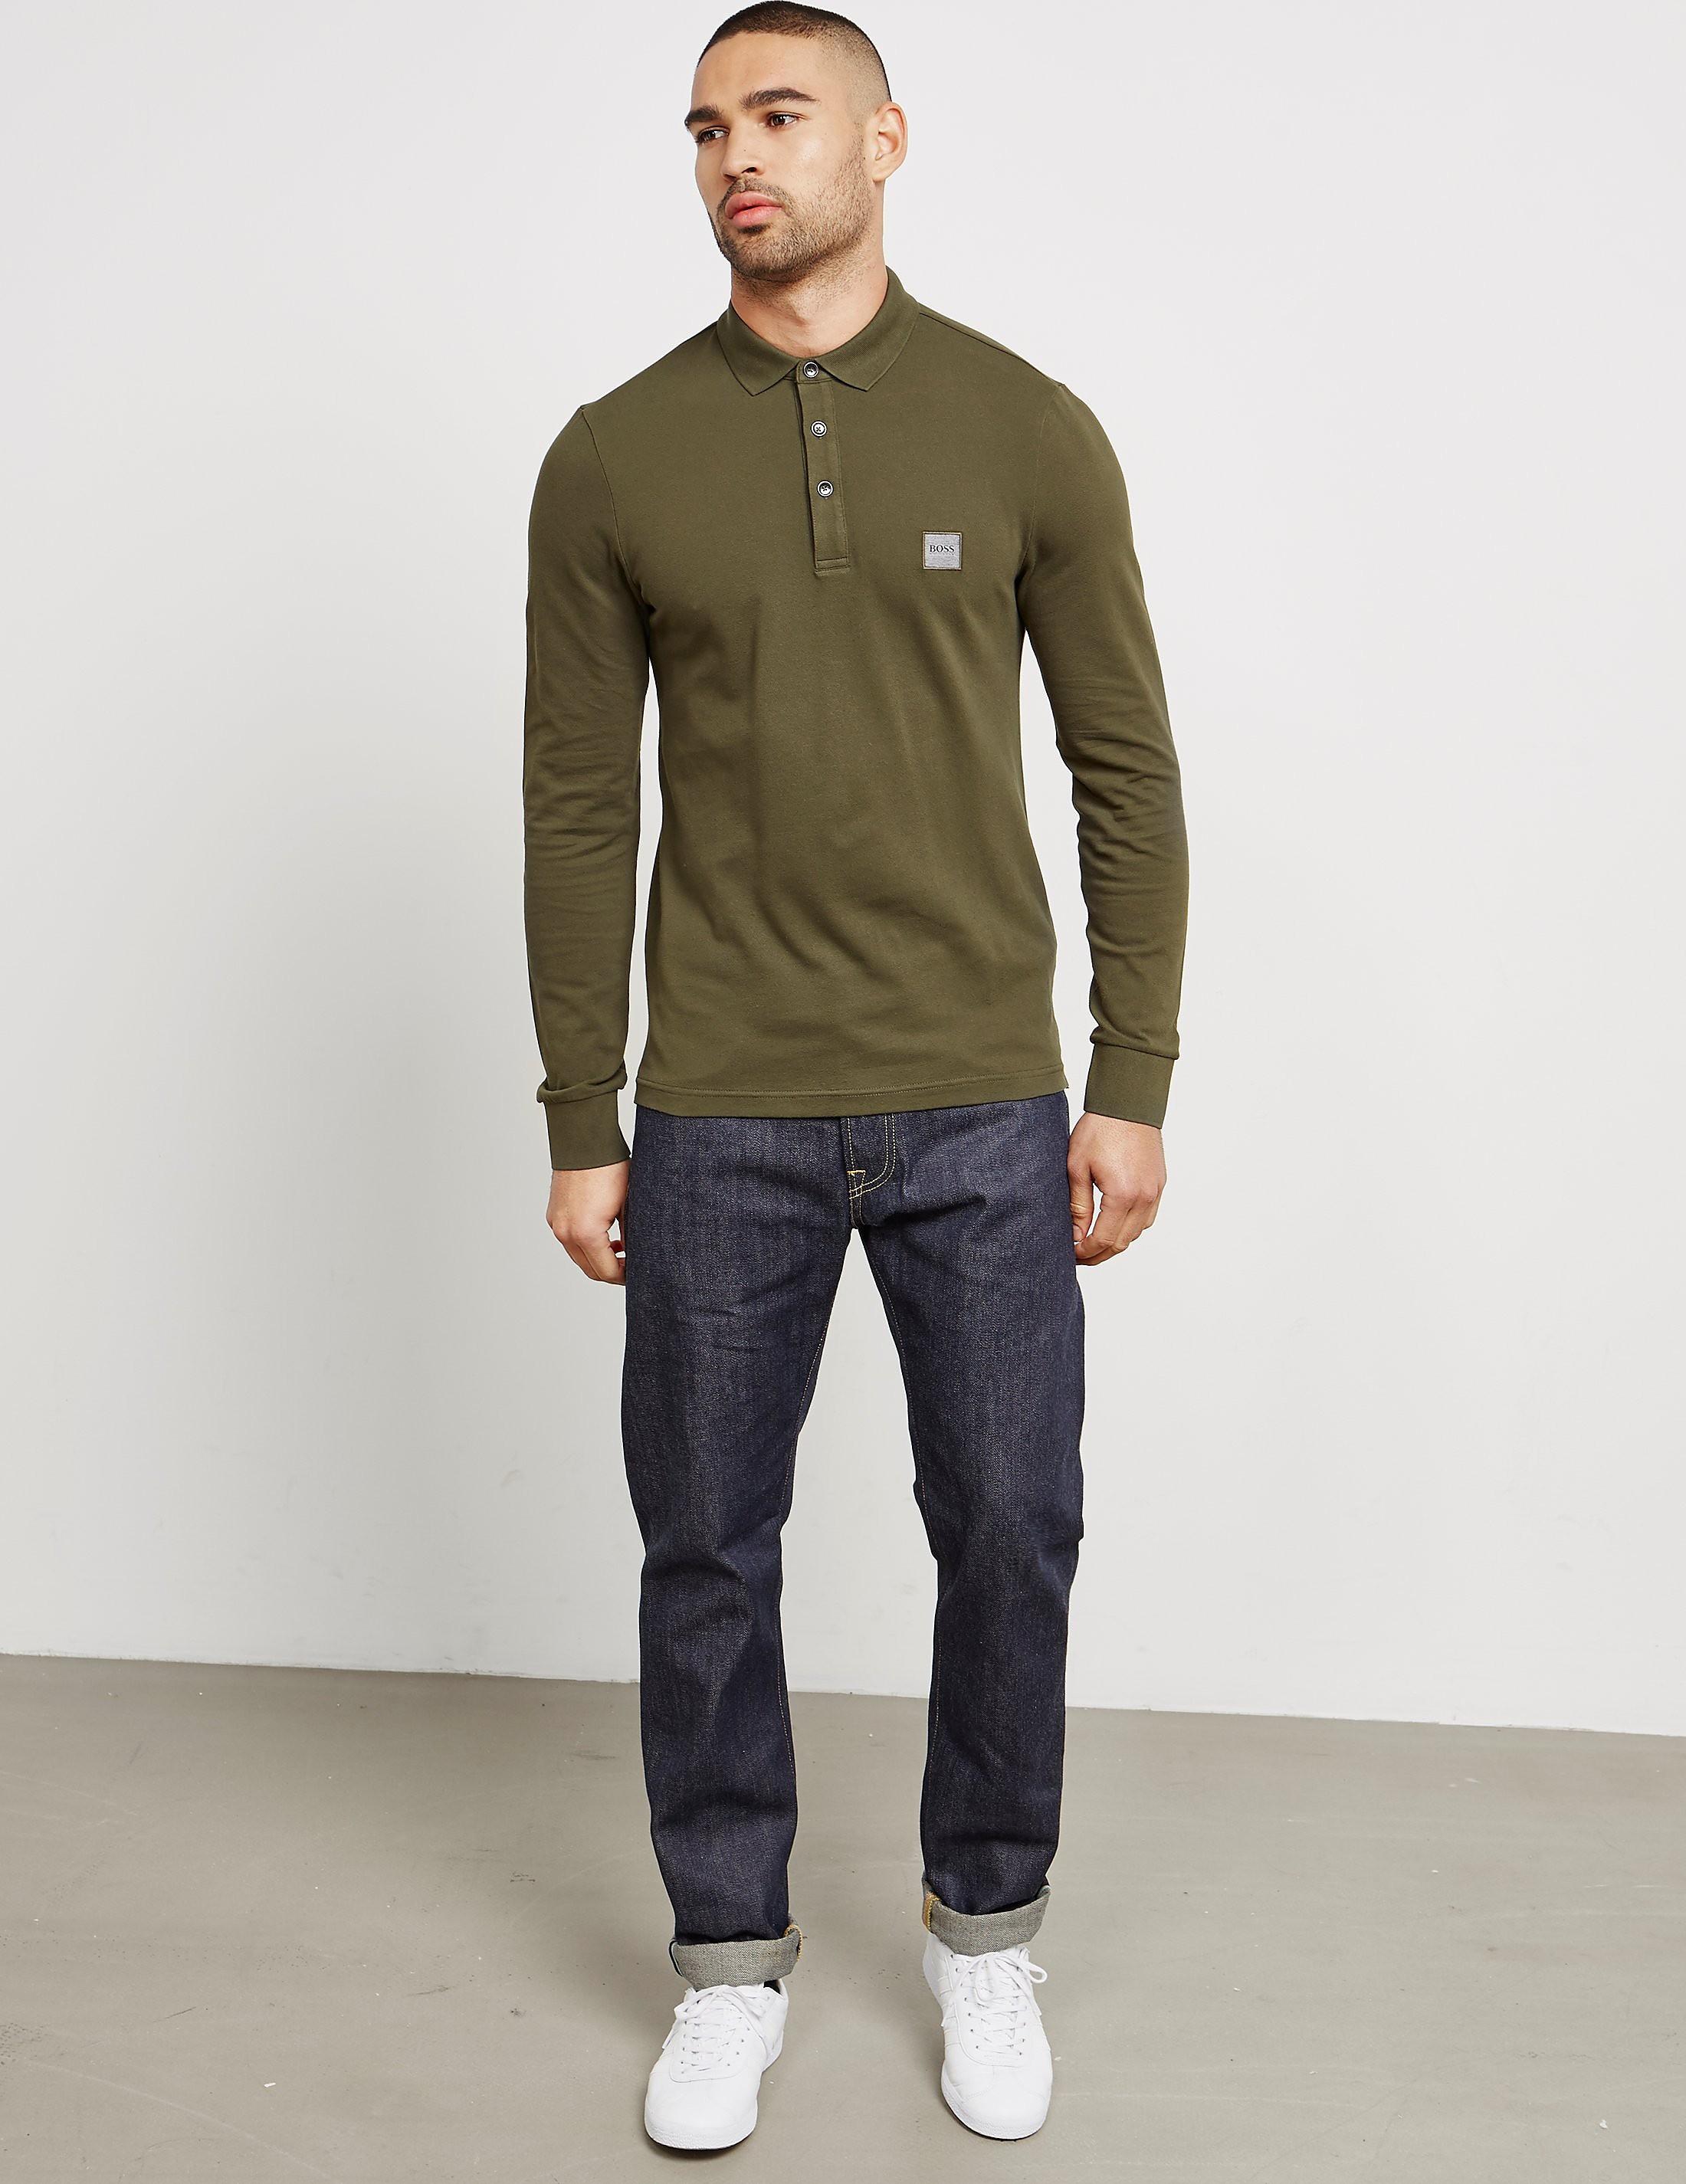 BOSS Orange Paulyn Long Sleeve Polo Shirt - Exclusive